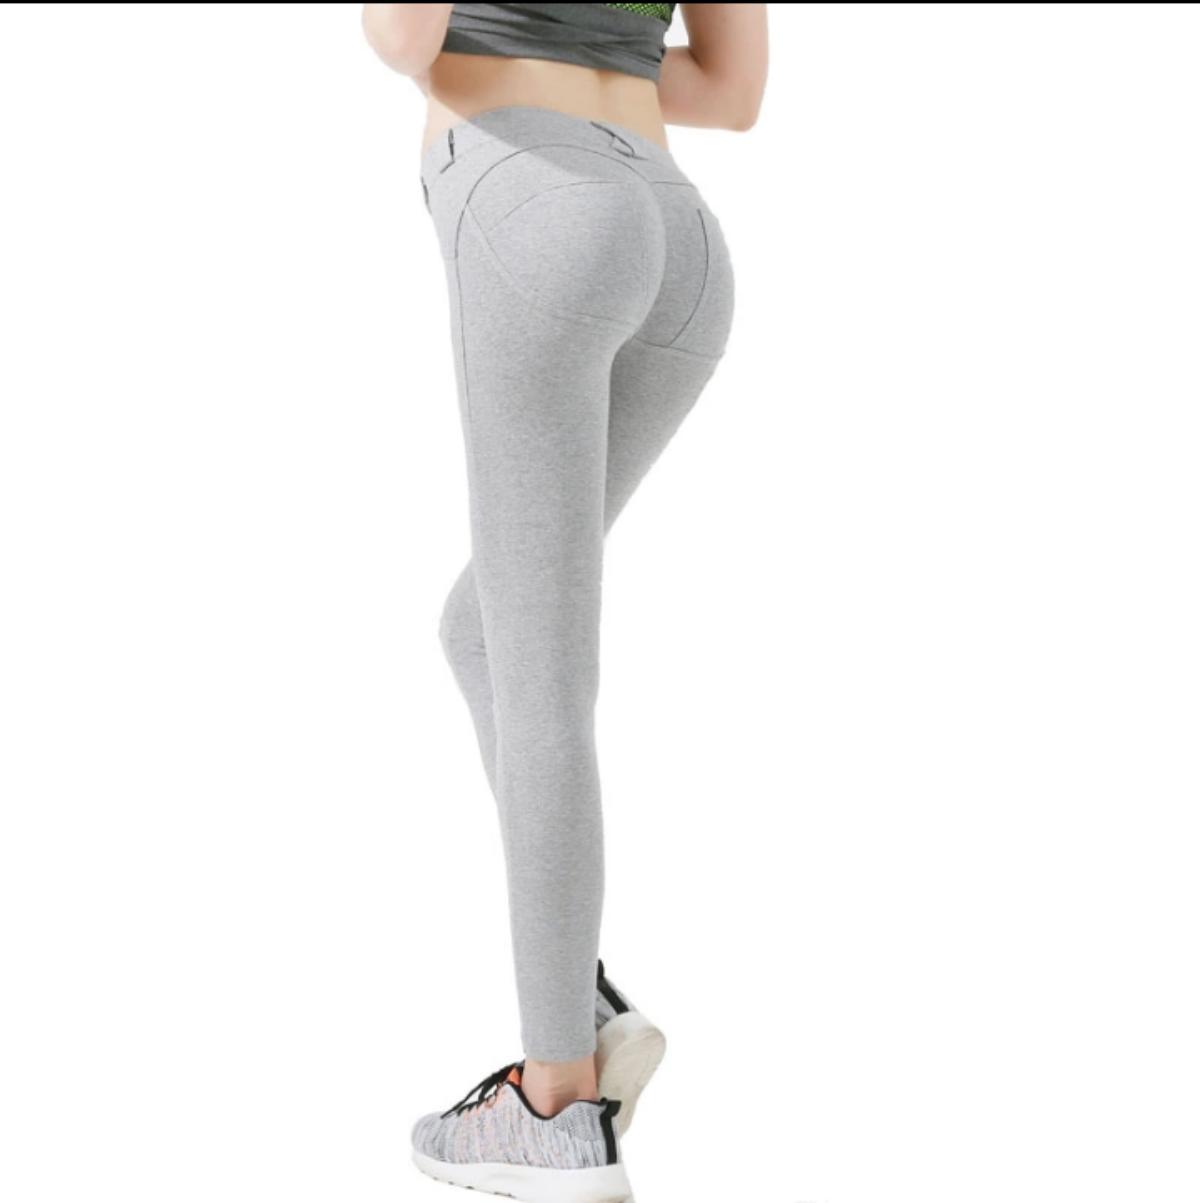 leggings push up